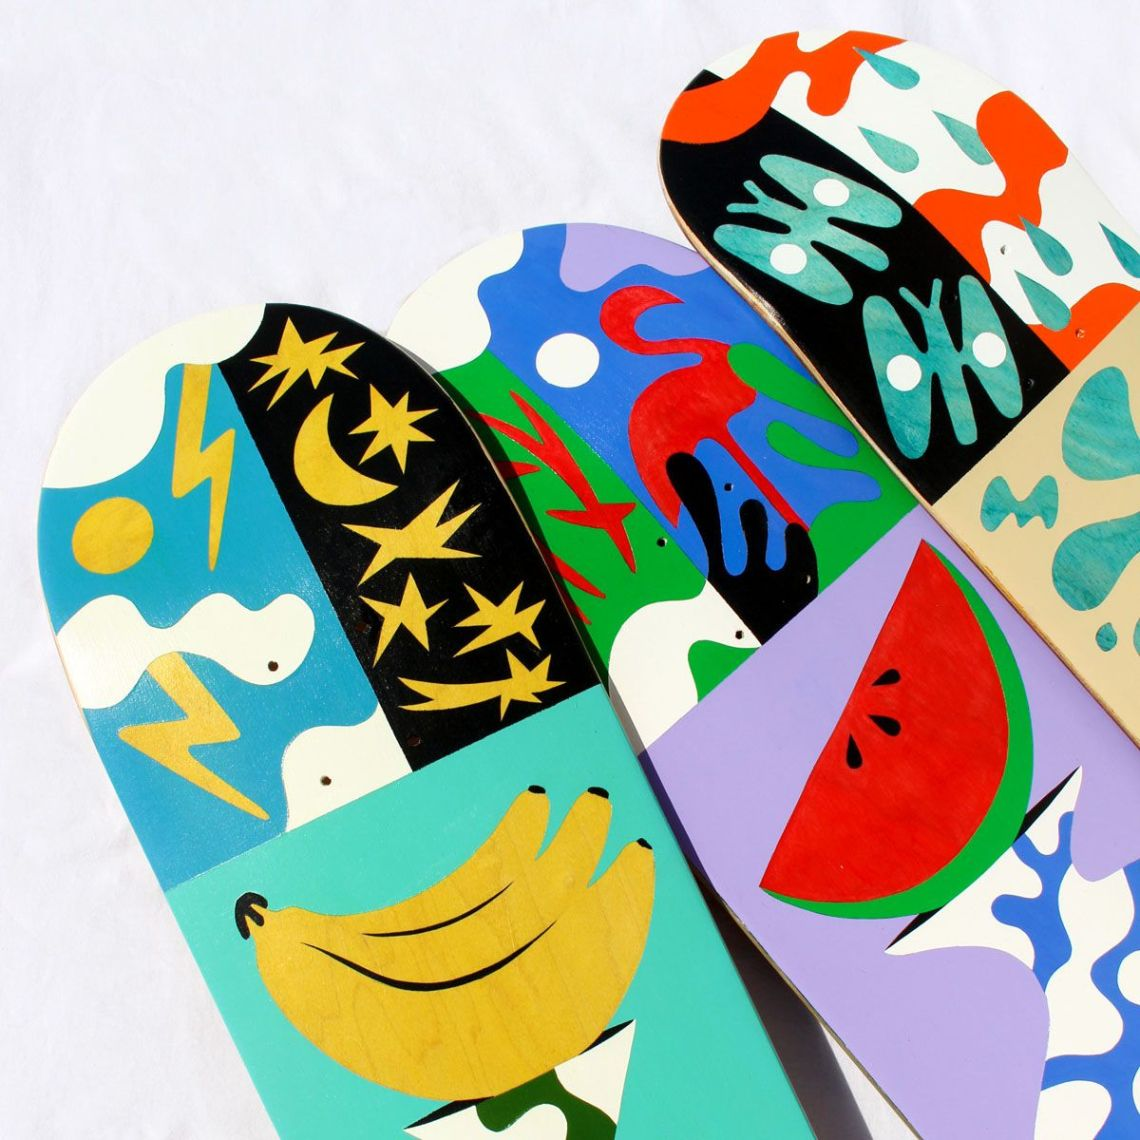 Custom Skateboards By Bart Lanzini For The European Custom Board Show 3